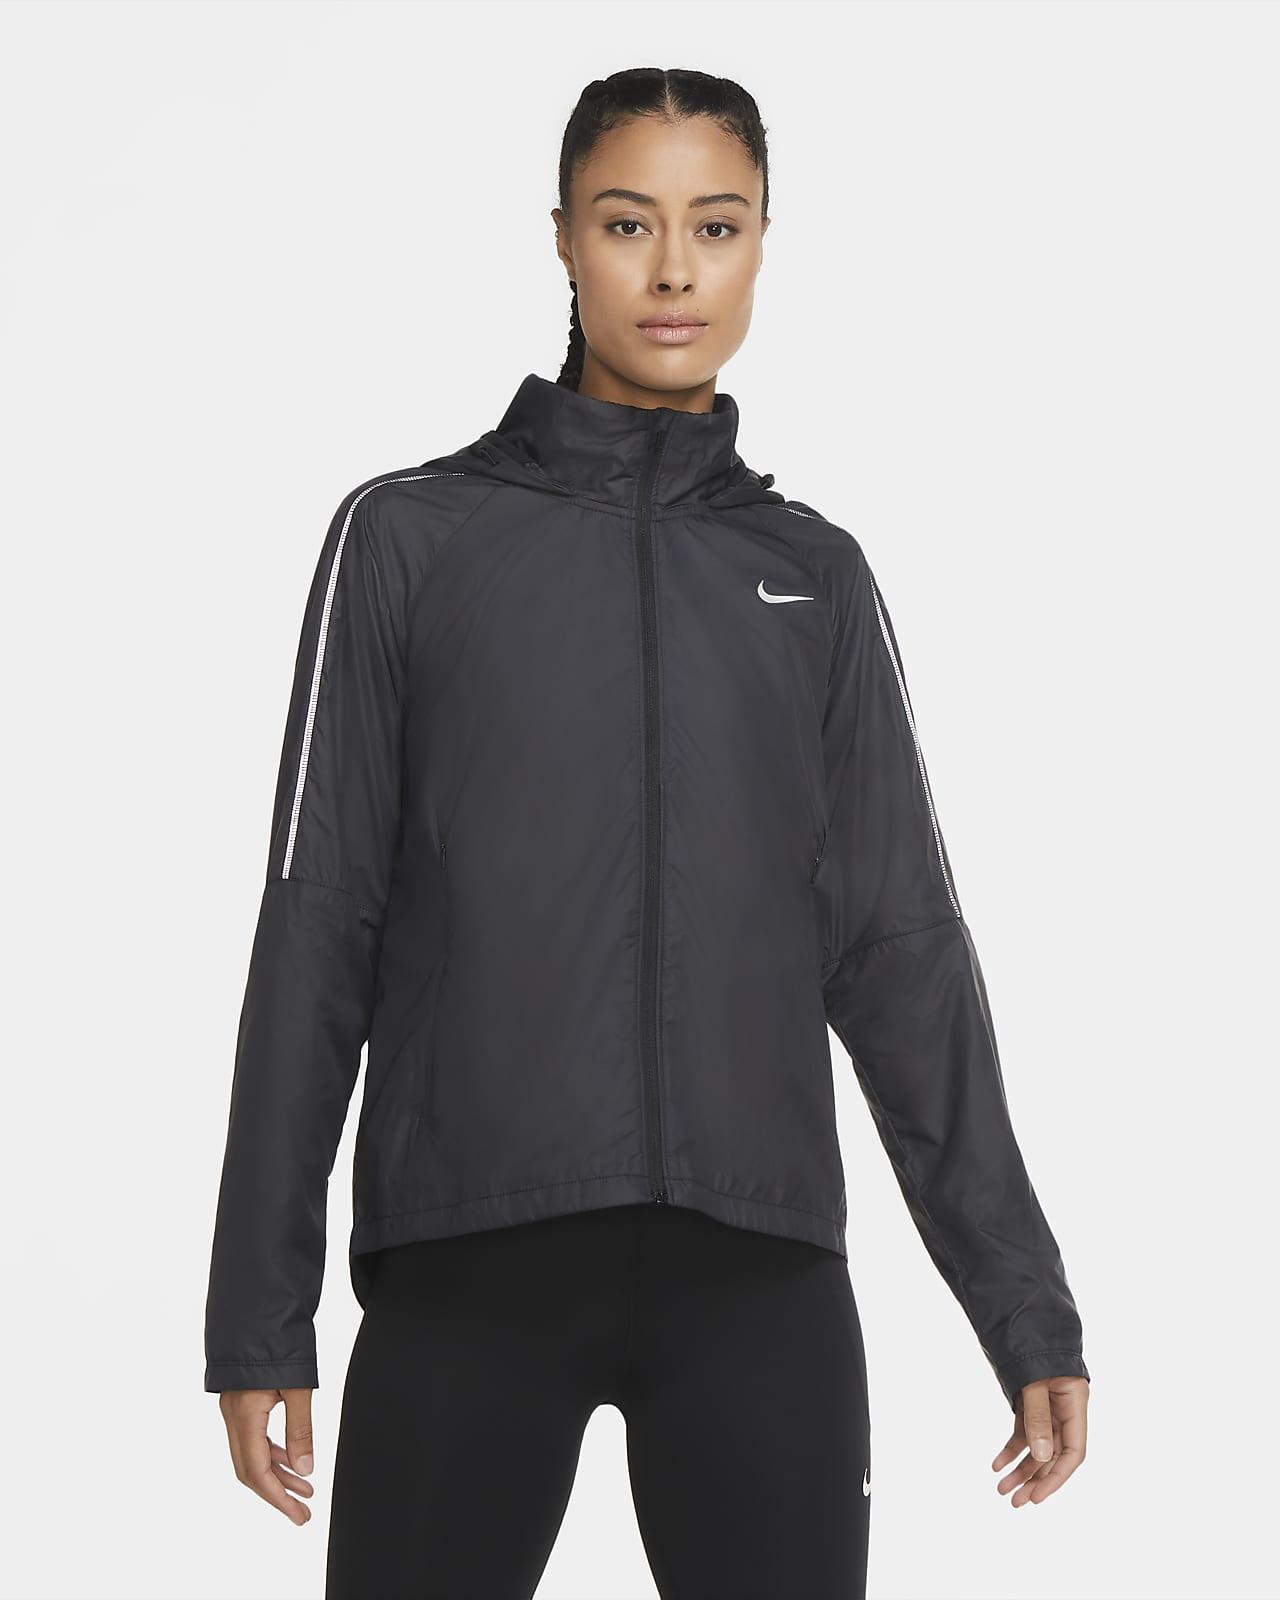 Veste de running Nike Shield pour Femme